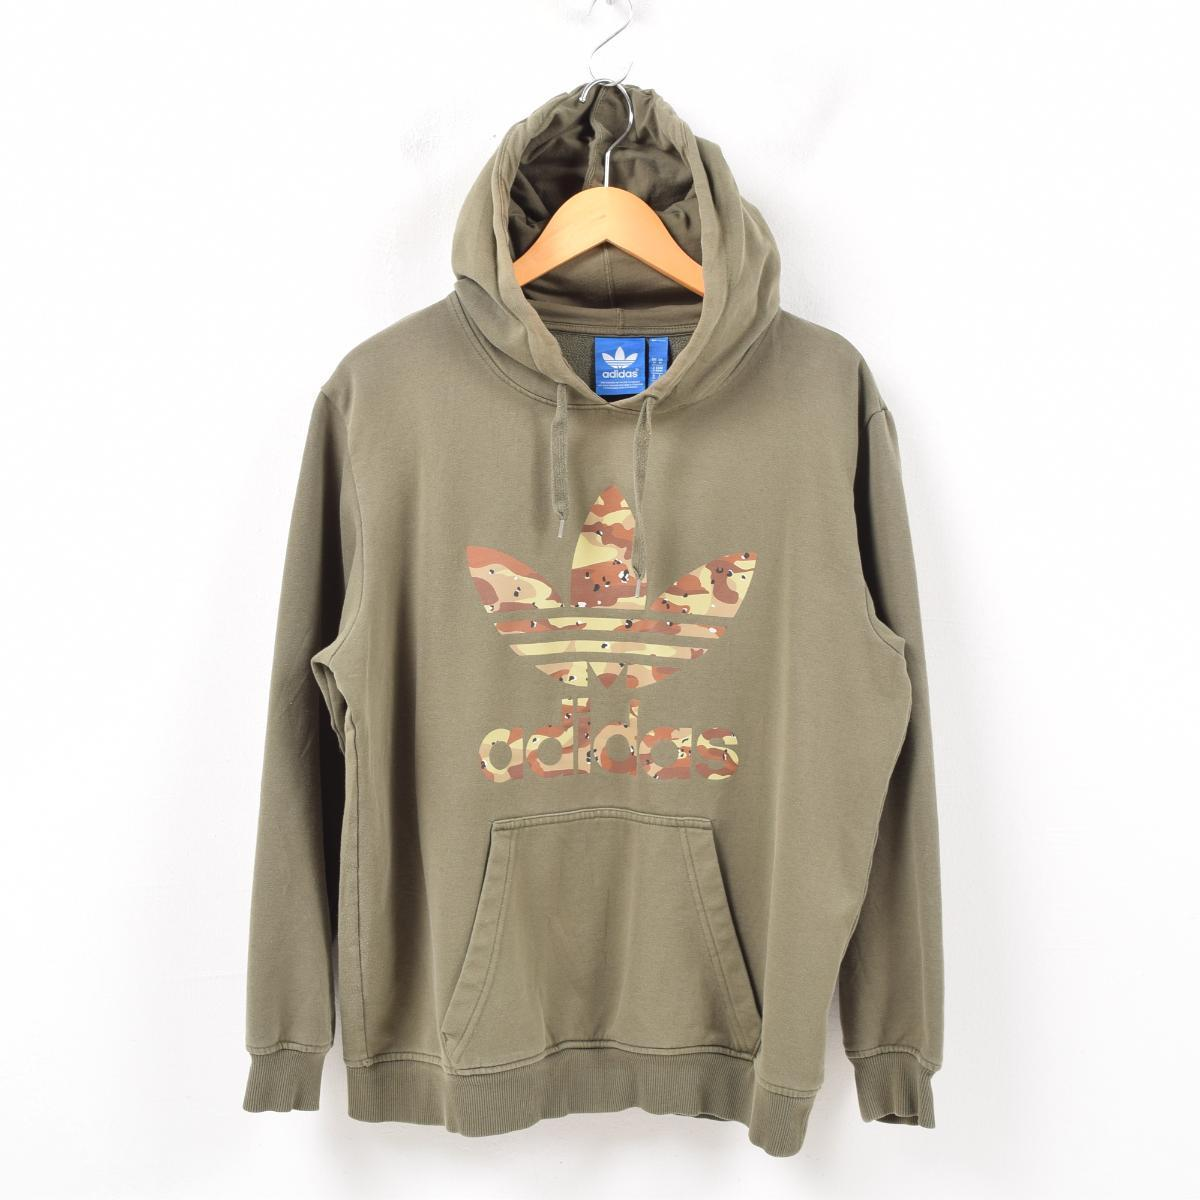 the best attitude 11c2d 52bea Adidas adidas ORIGINALS originals camouflage logo print sweat shirt  pullover parka men M /wbb0597